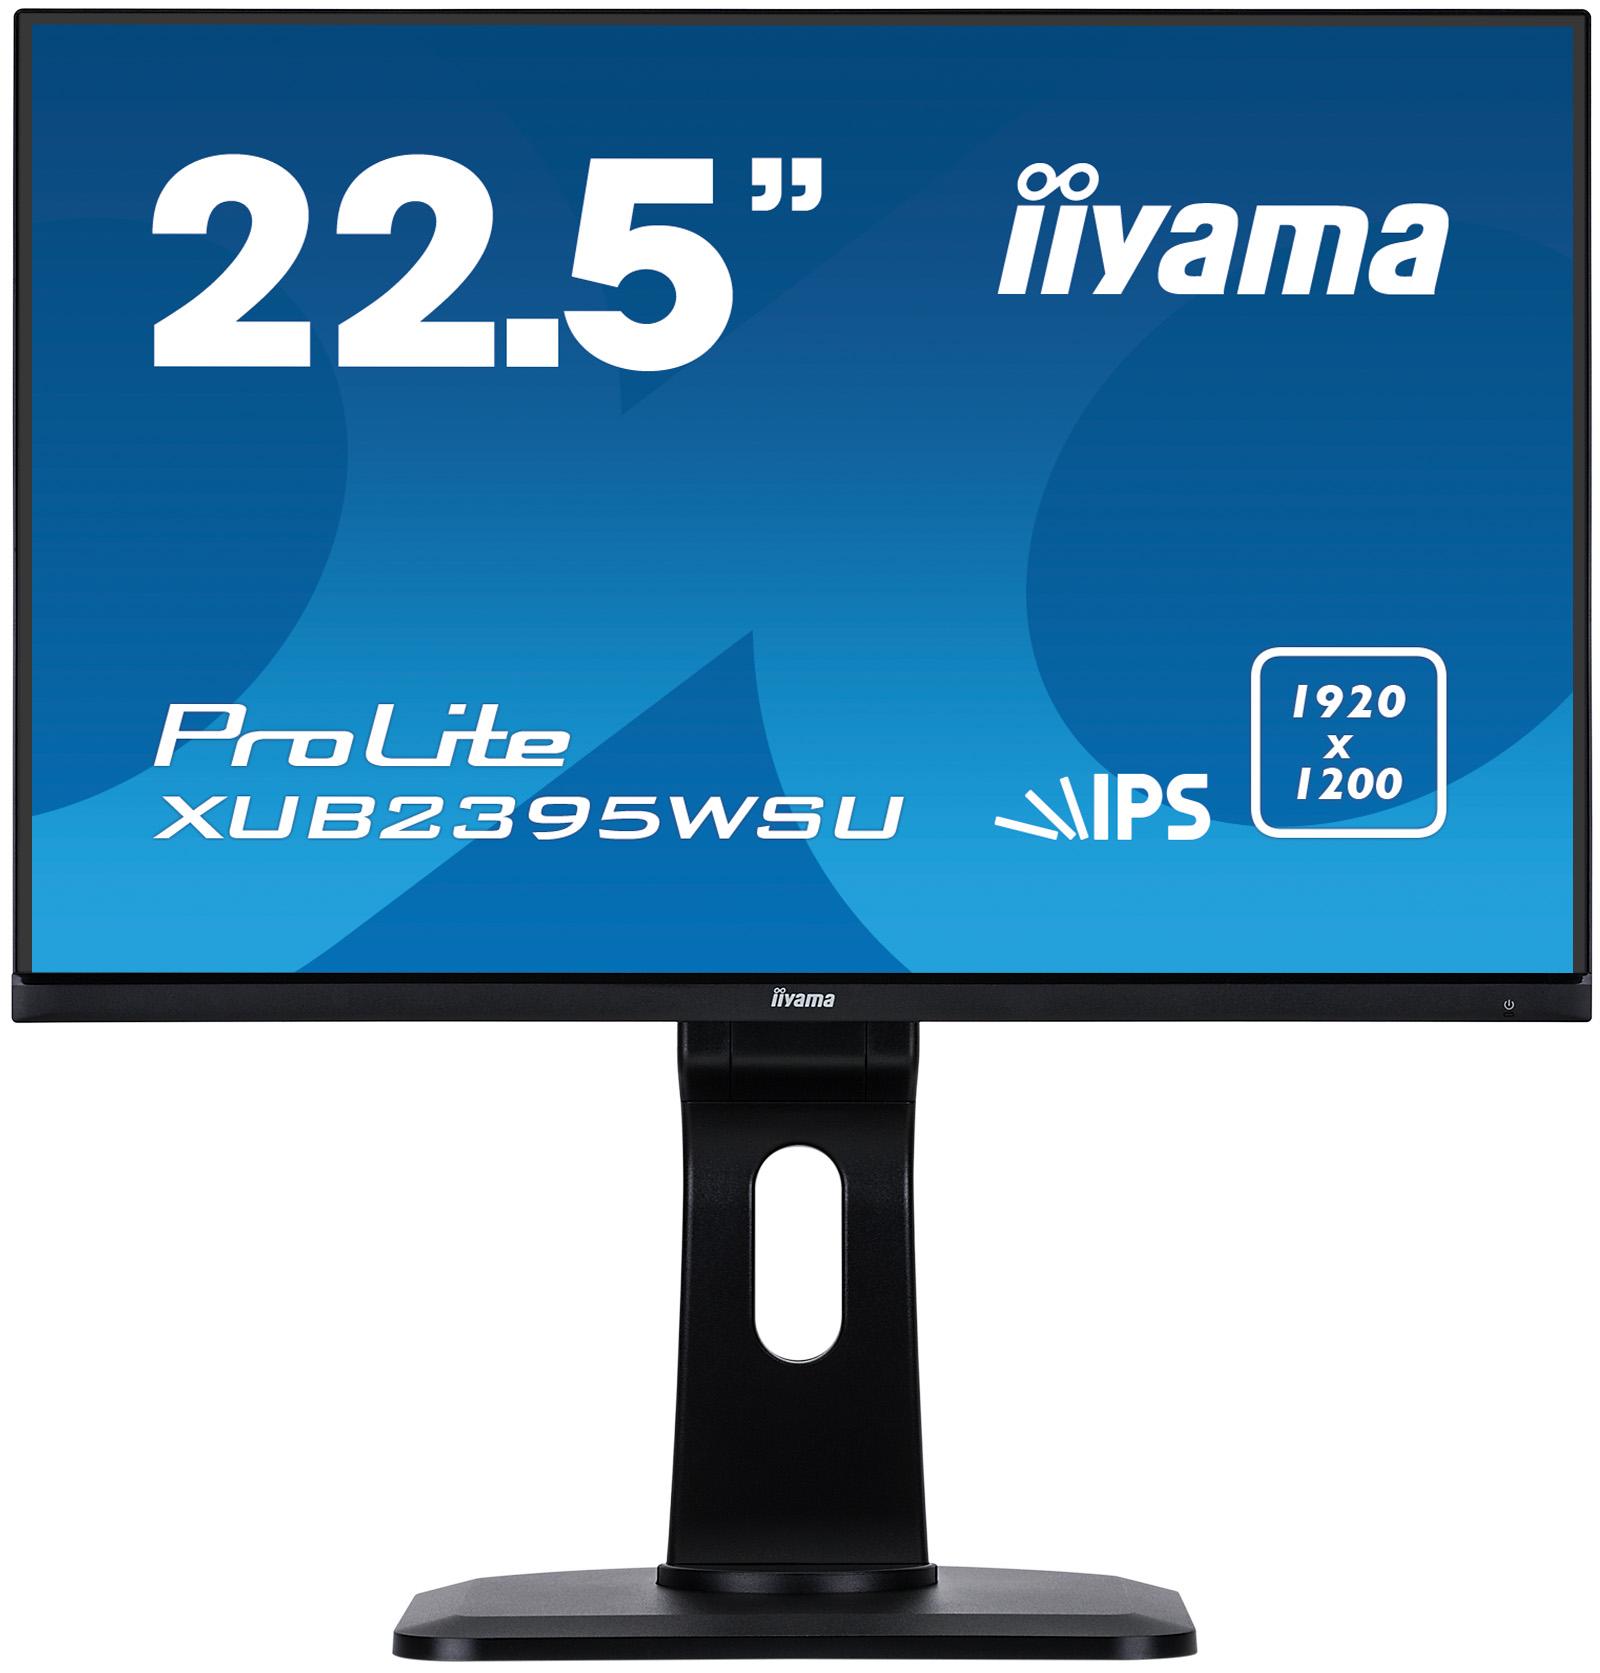 23'' iiyama XUB2395WSU-B1 - IPS,1920x1200,4ms,250cd/m2, 1000:1,16:10,VGA,HDMI,DP,USB,repro.,pivot - XUB2395WSU-B1